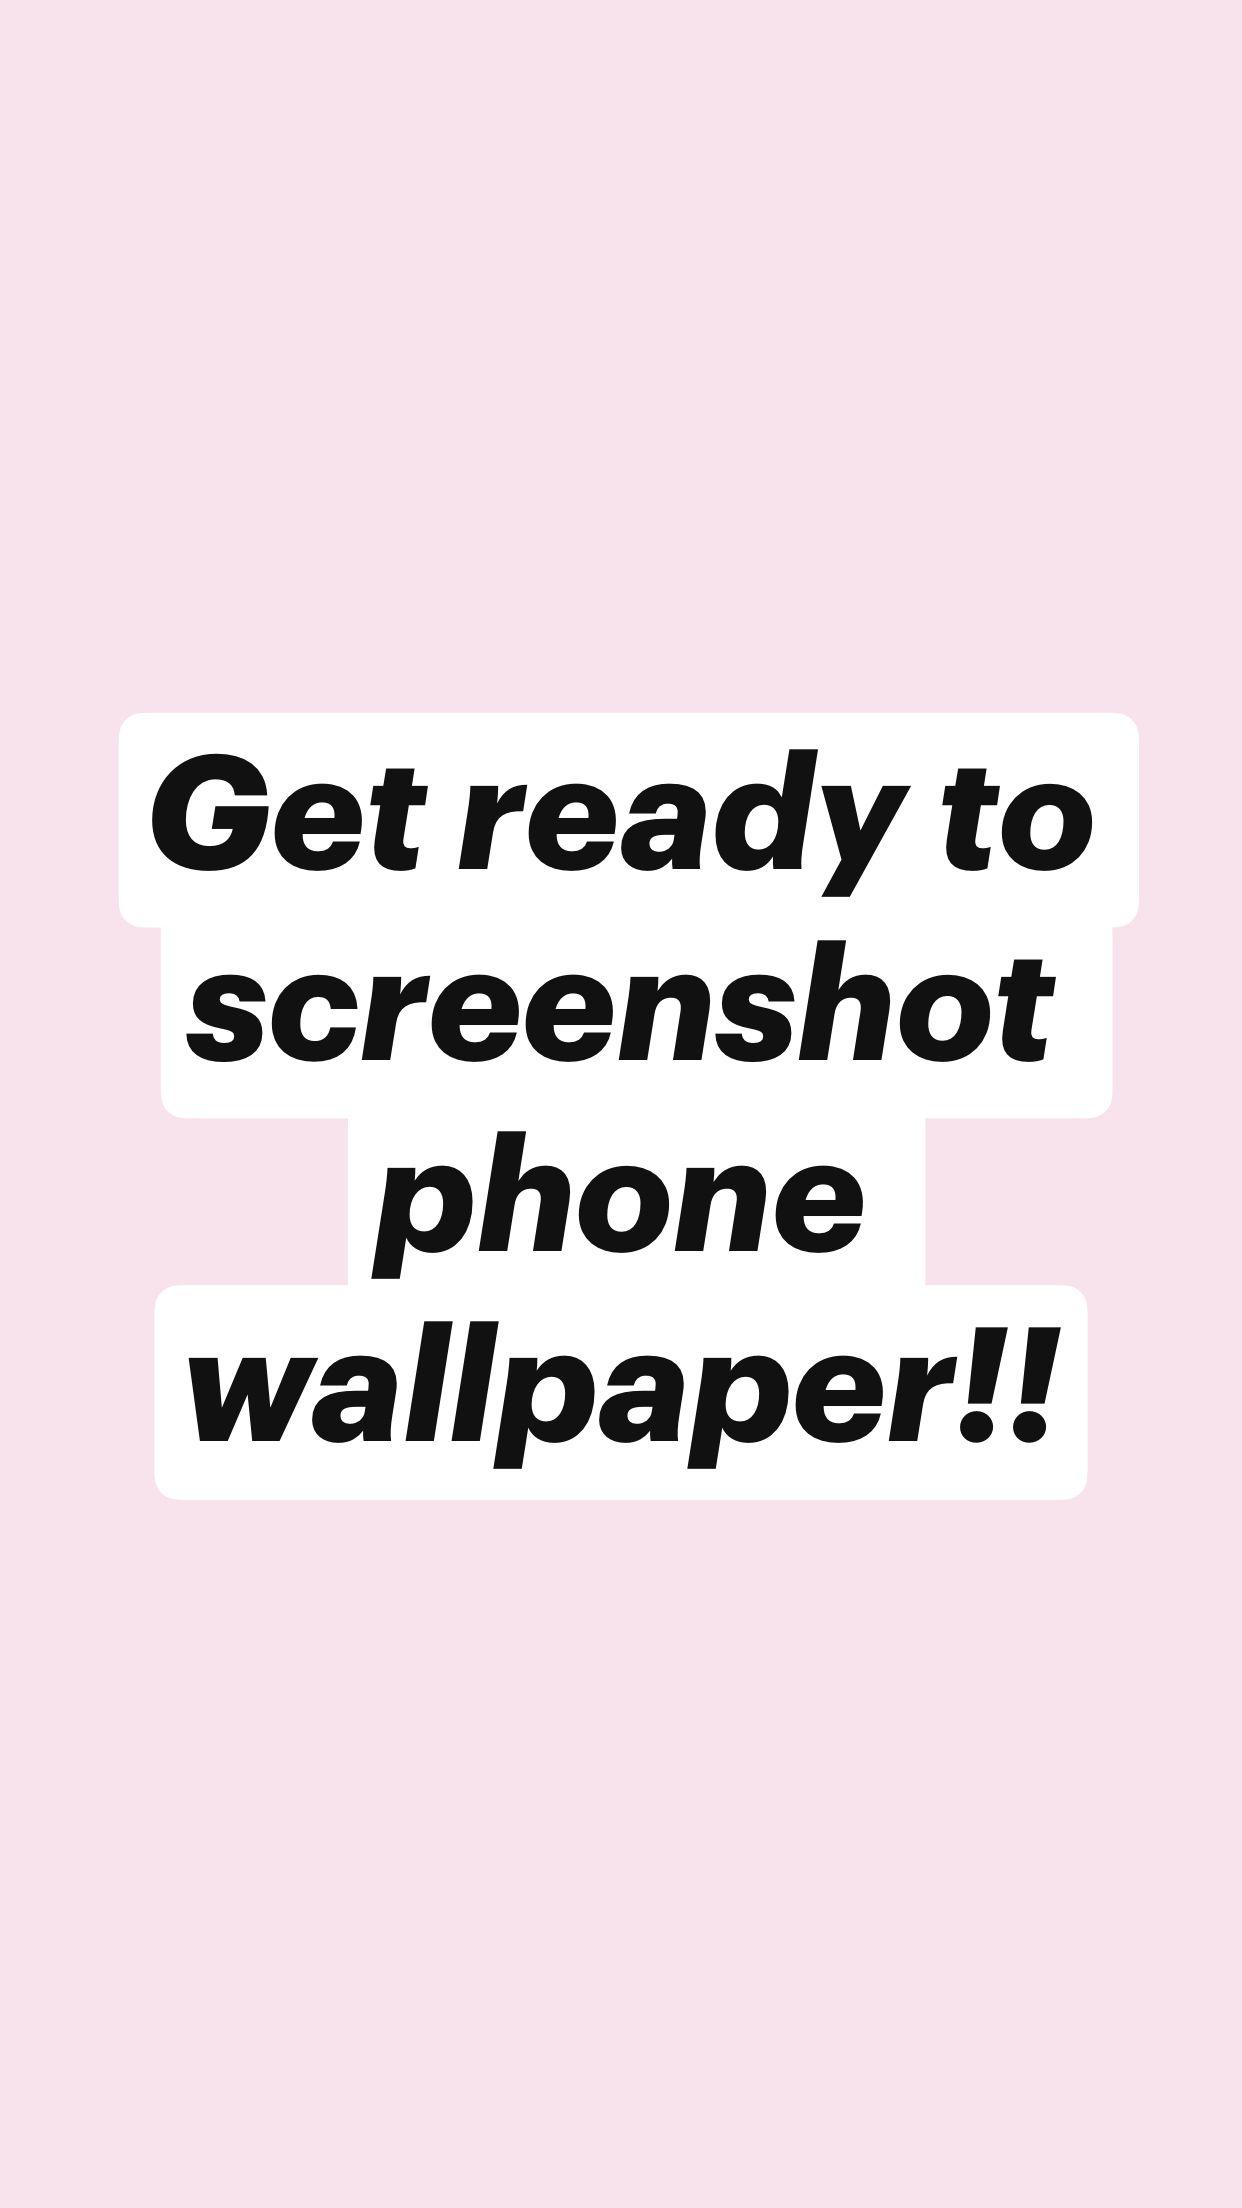 Get ready to screenshot phone wallpaper!!